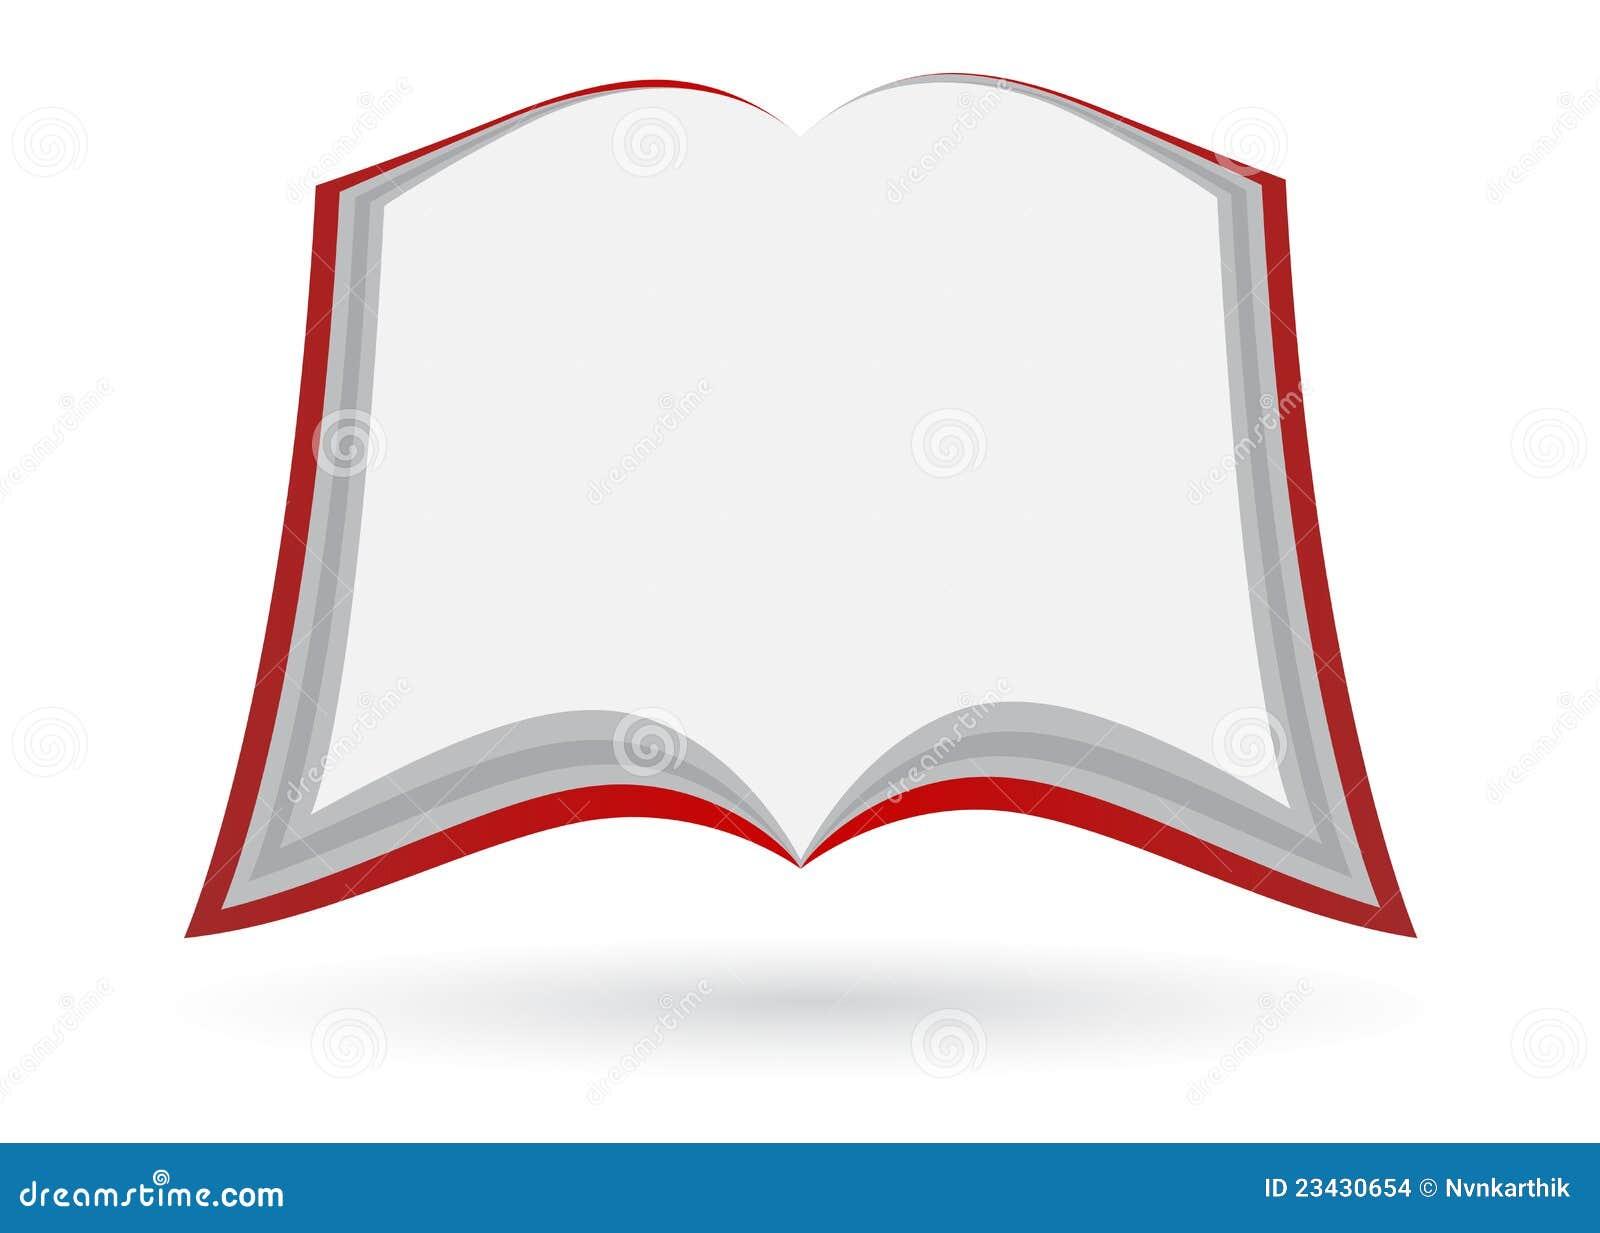 Anule o livro aberto